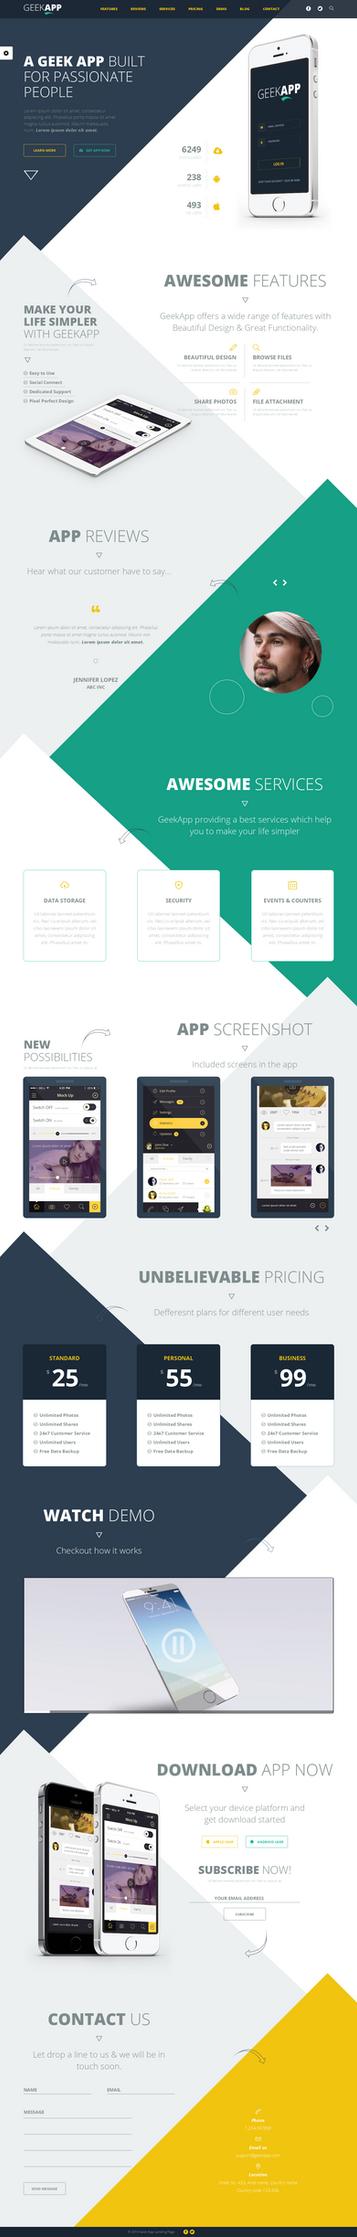 GeekApp - Creative App Landing Page, Blog Theme by sandracz